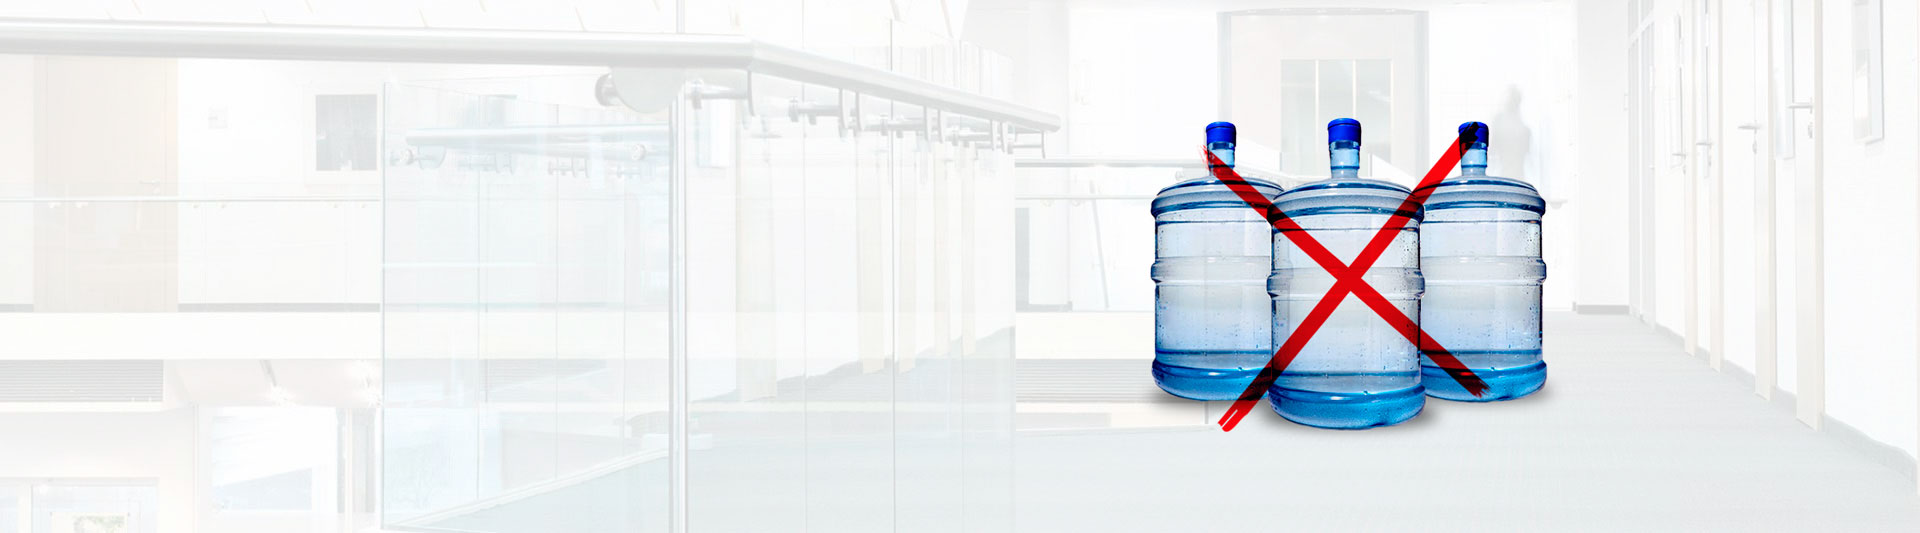 dispensadores-de-agua-empresa